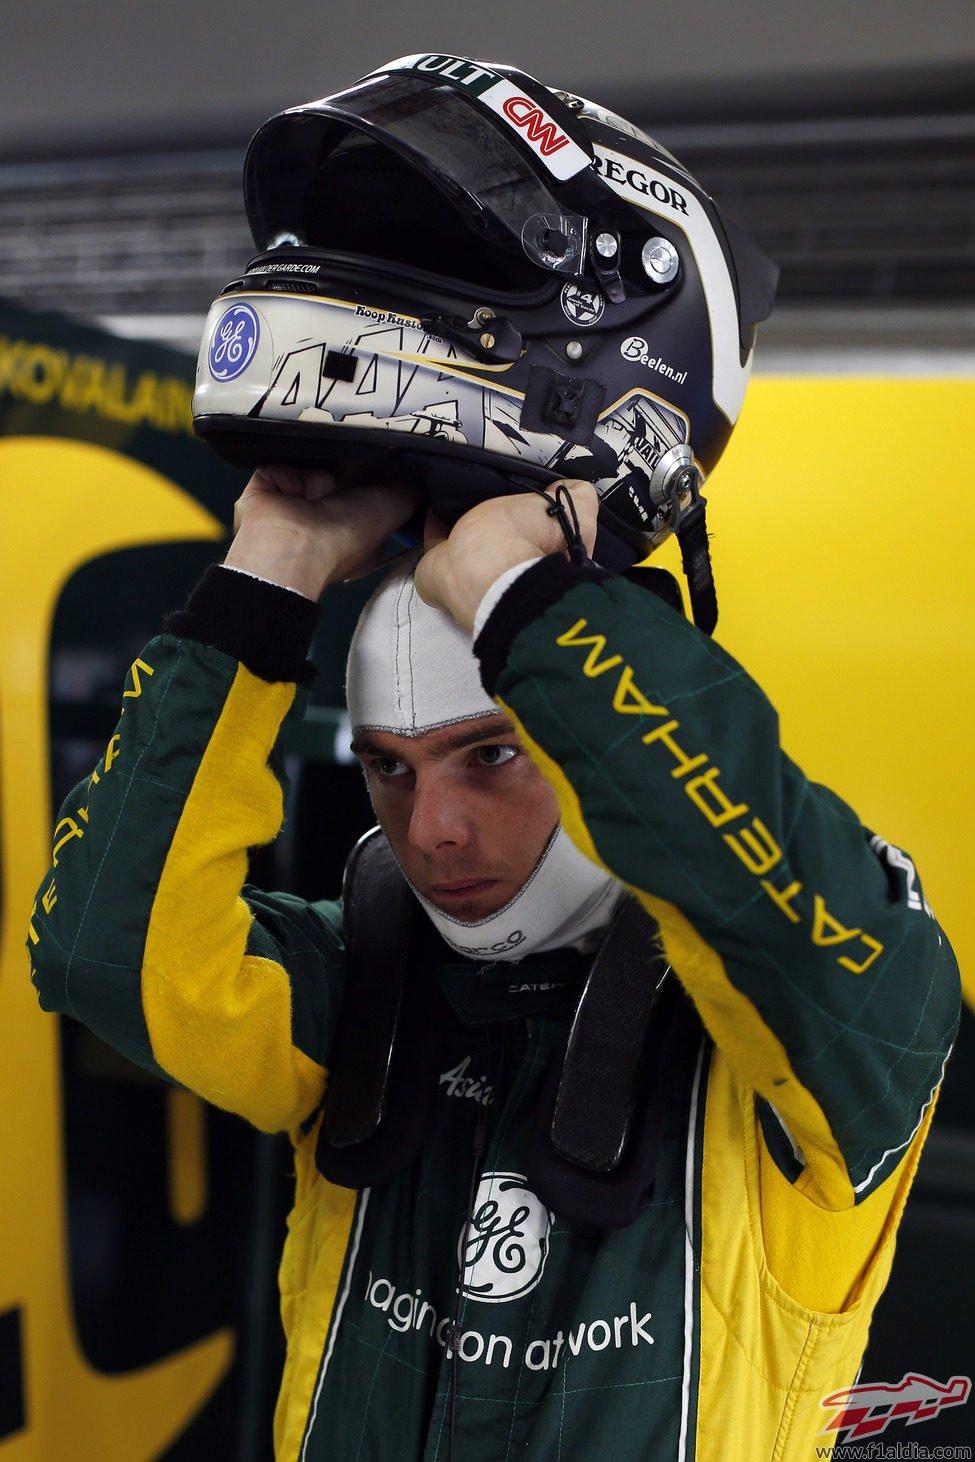 Giedo van der Garde se pone el casco